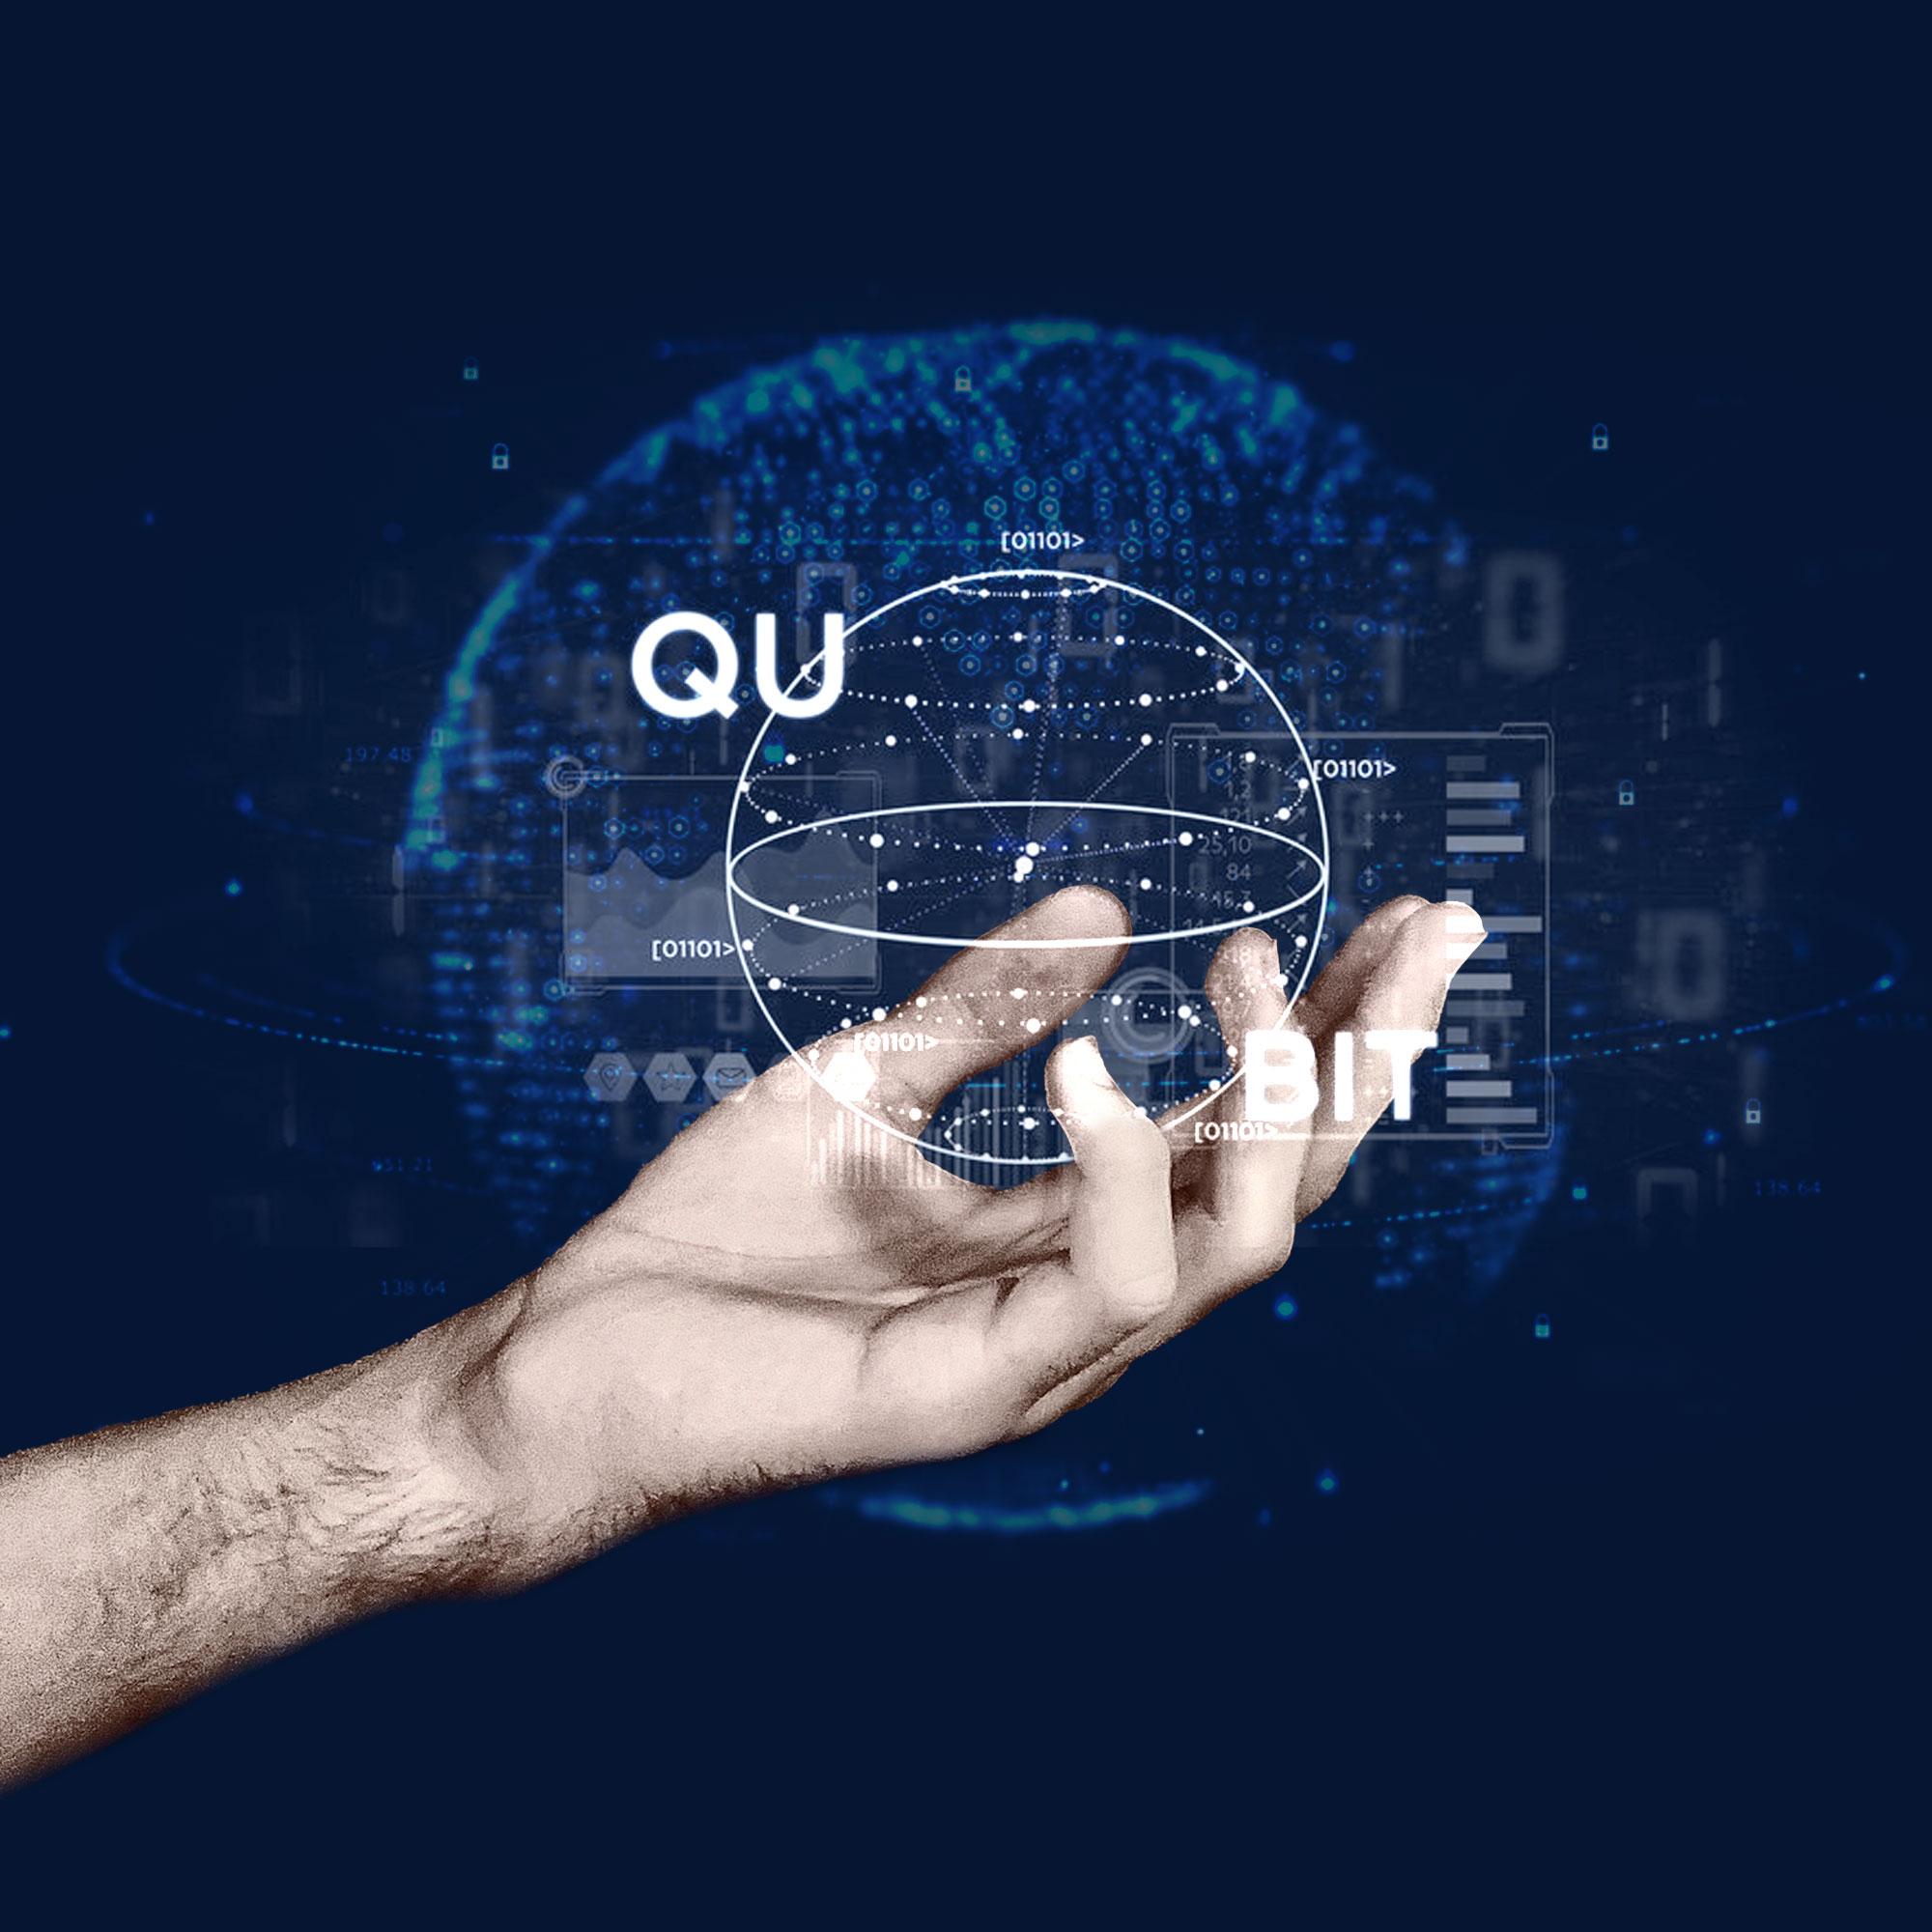 Introduction to Quantum Computing and Qiskit